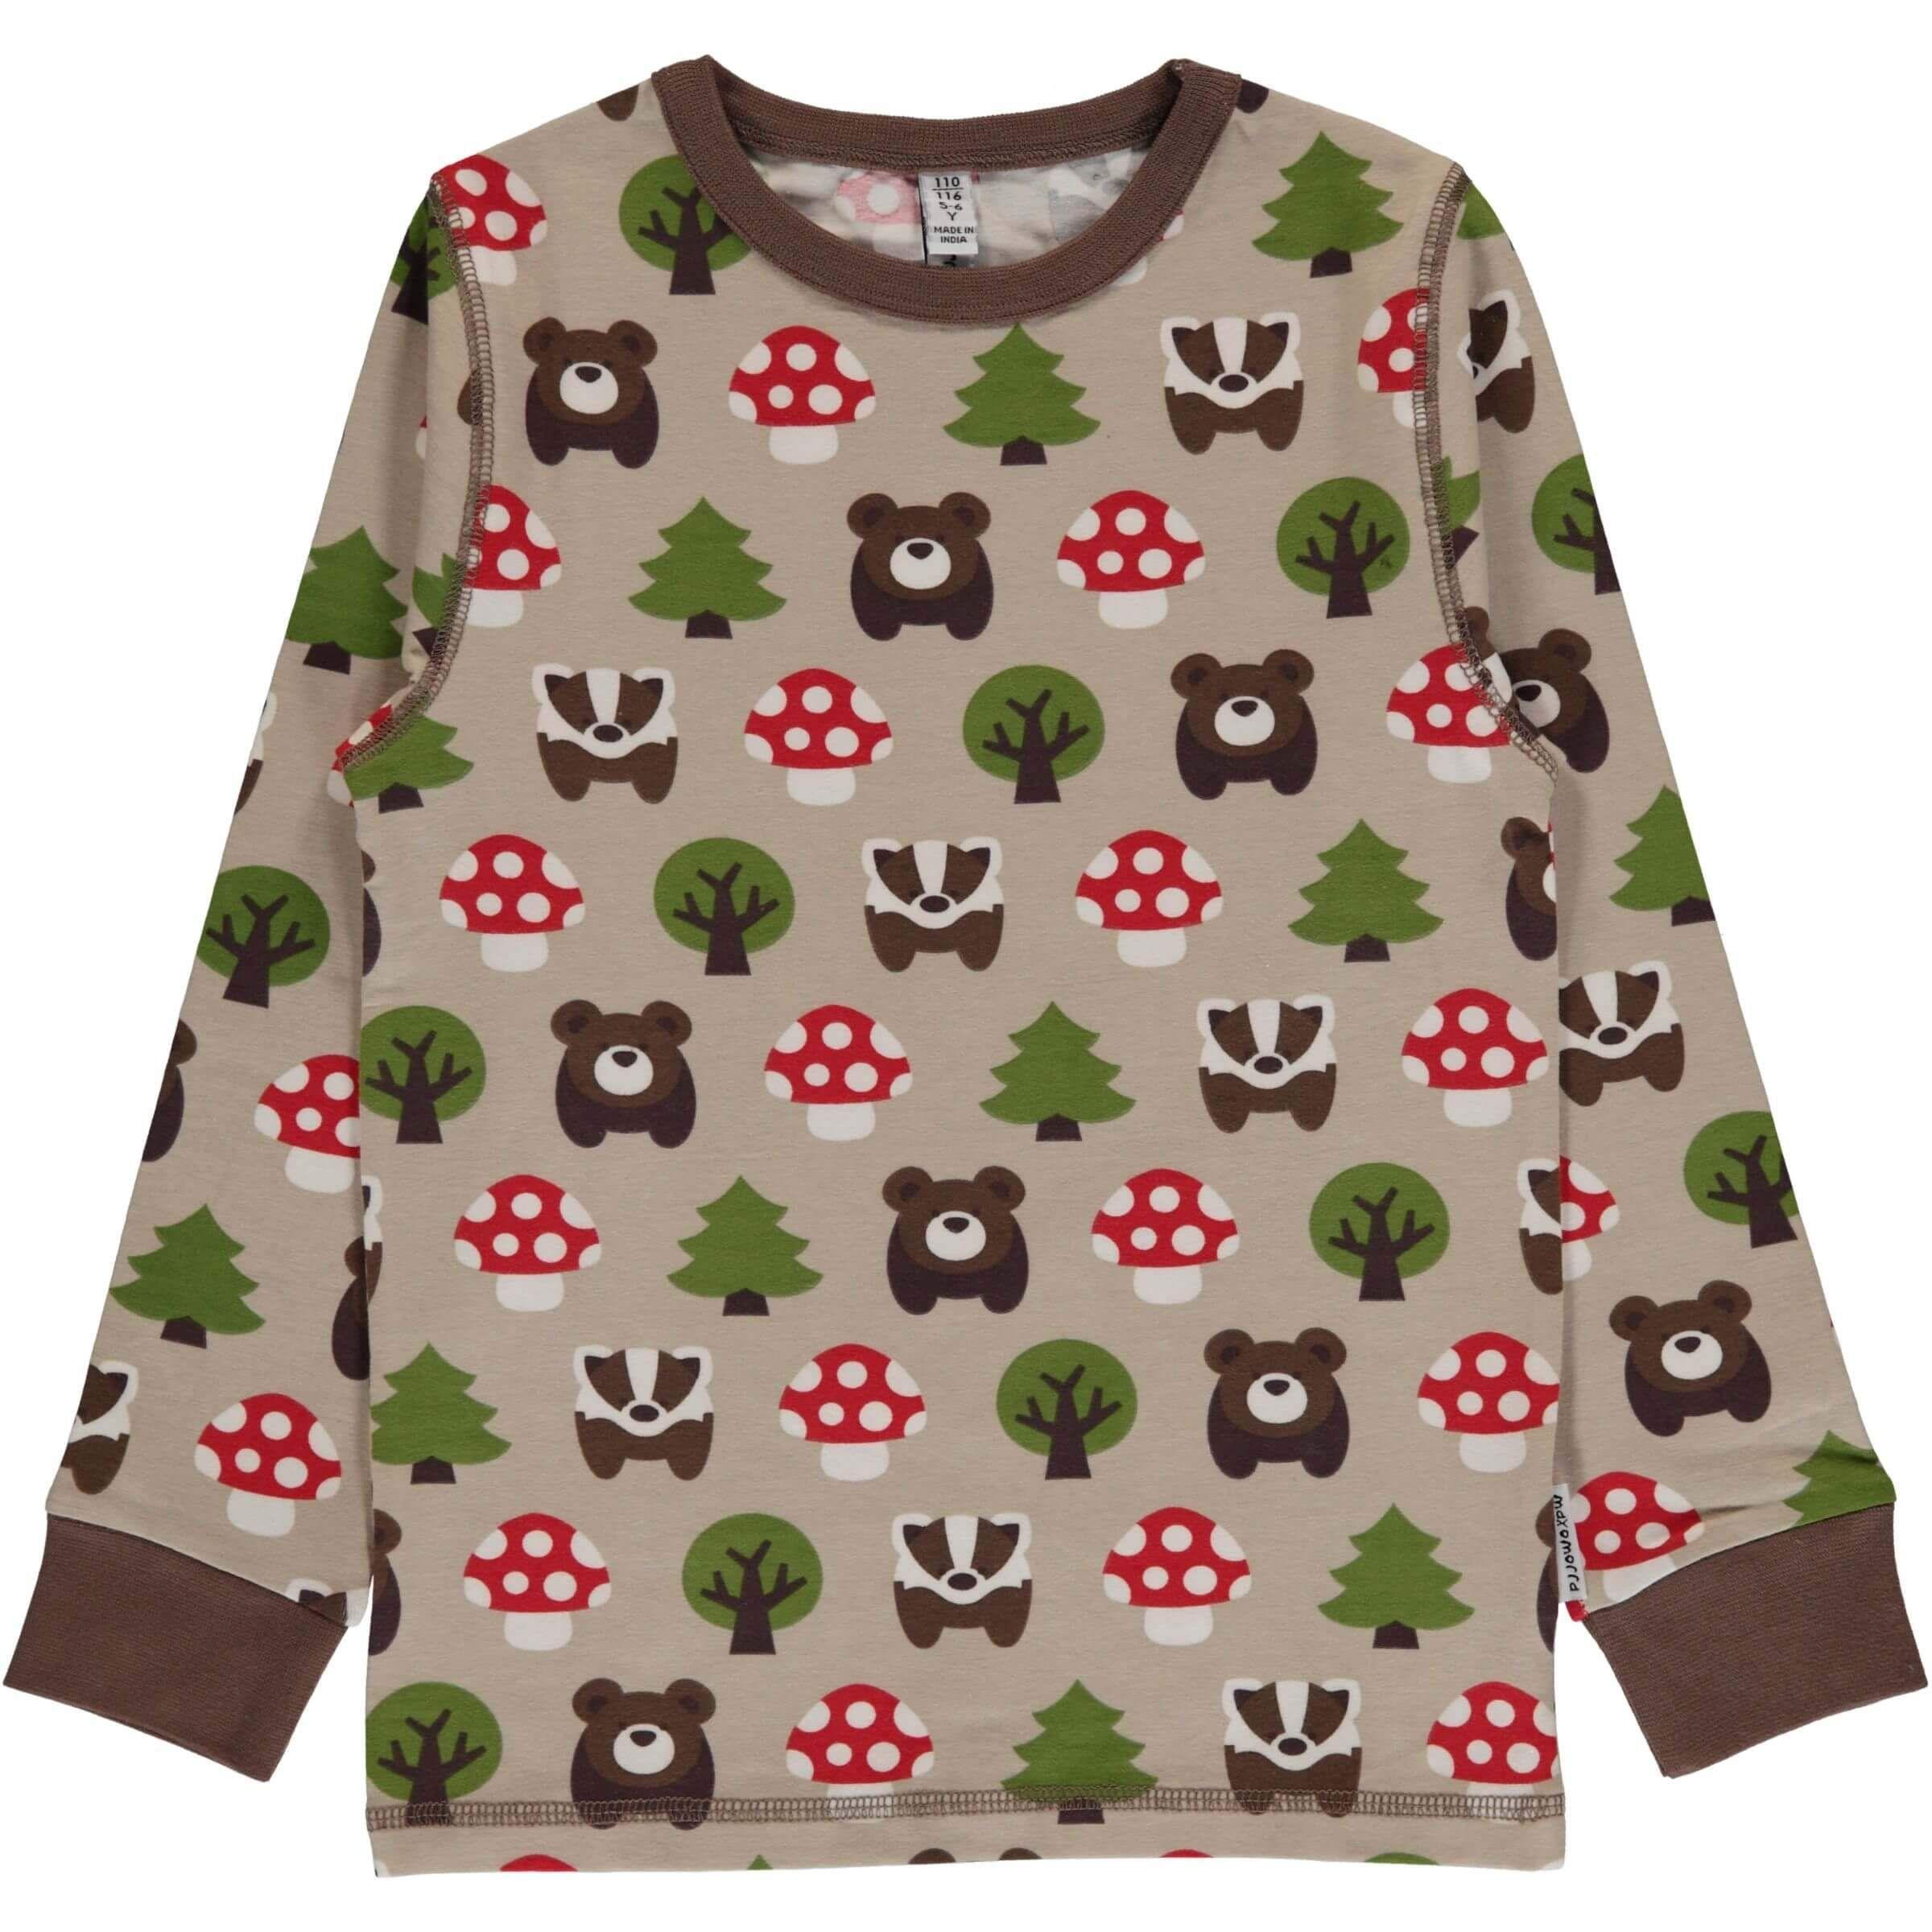 Forest Long Sleeve Shirt Modern Rascals From Maxomorra A Swedish Children S Clothing Compa Organic Kids Clothes Scandinavian Kids Clothes Shop Kids Clothes